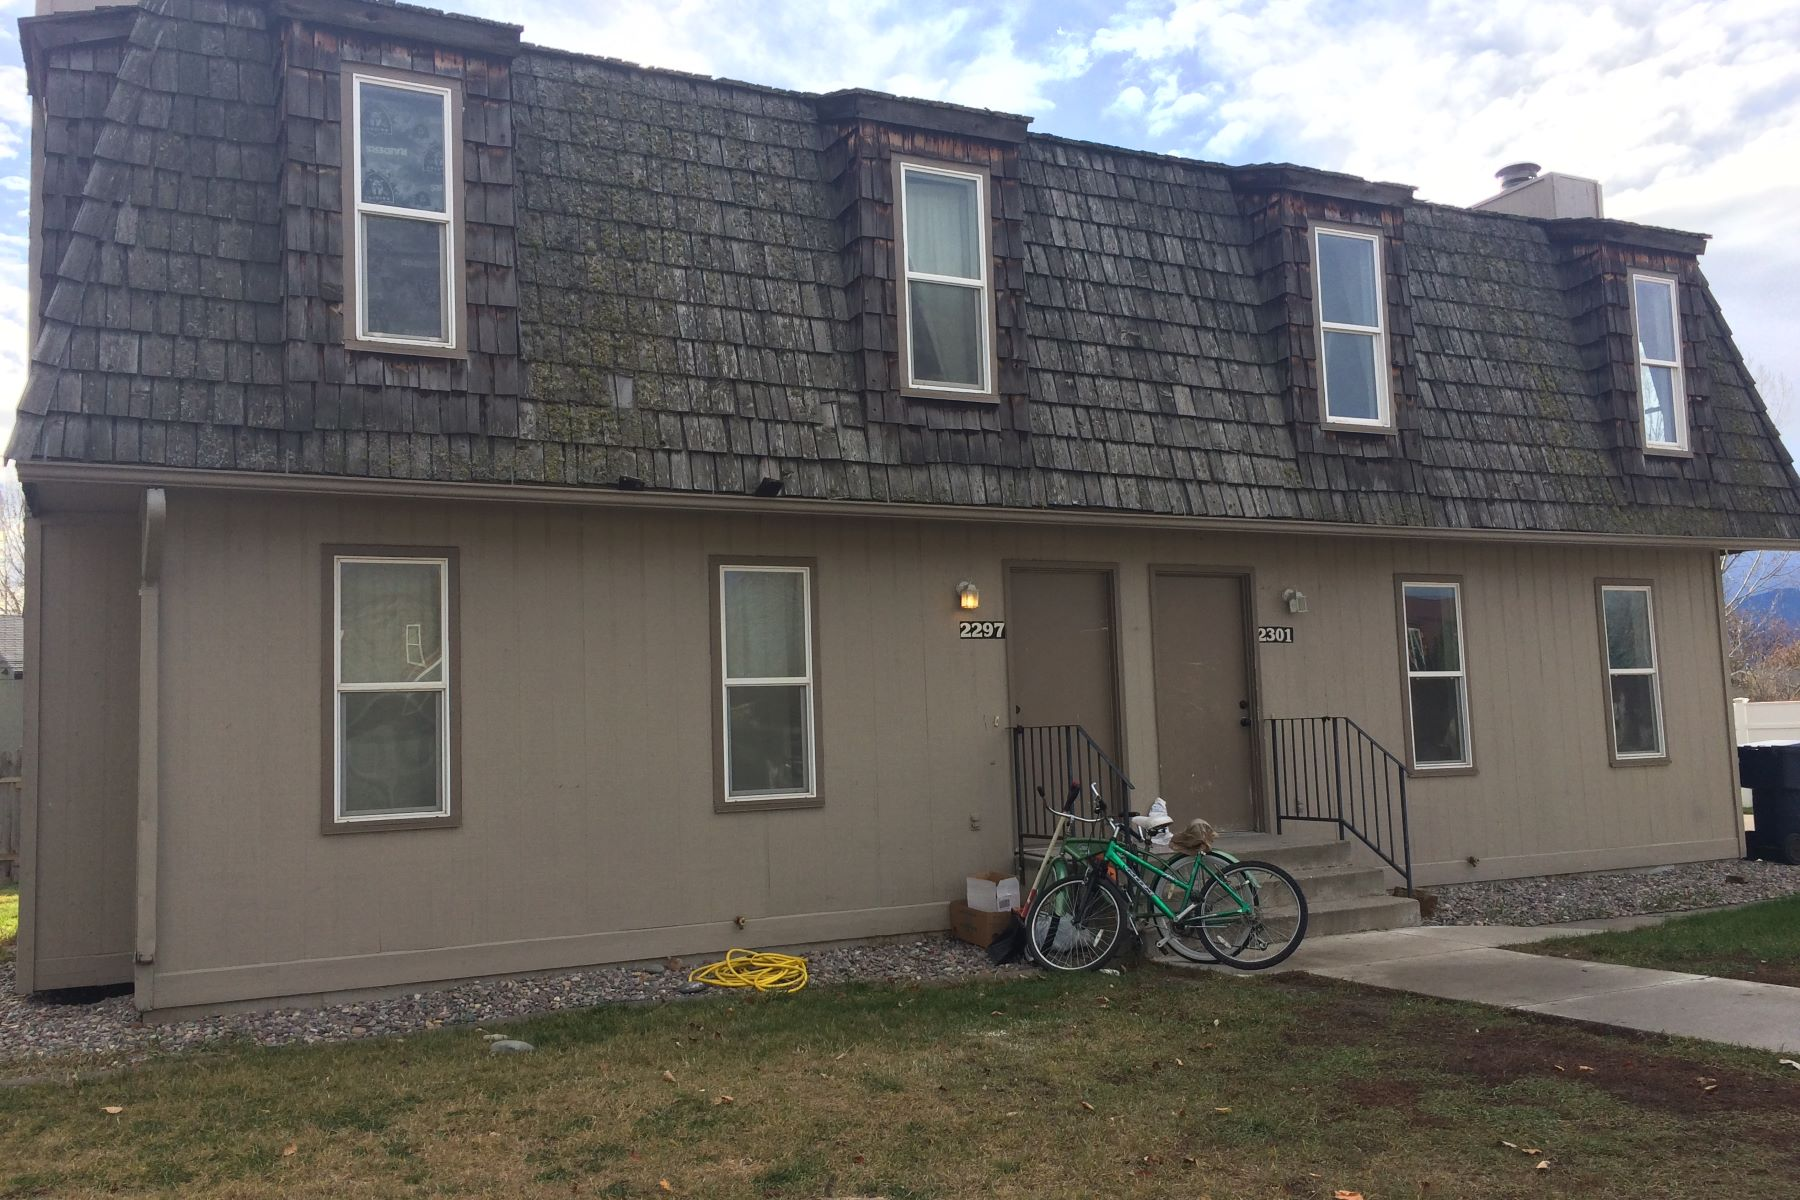 Additional photo for property listing at 2297 Sherwood Lane, Missoula, MT 59801 2297  Sherwood Ln Missoula, Montana 59801 United States